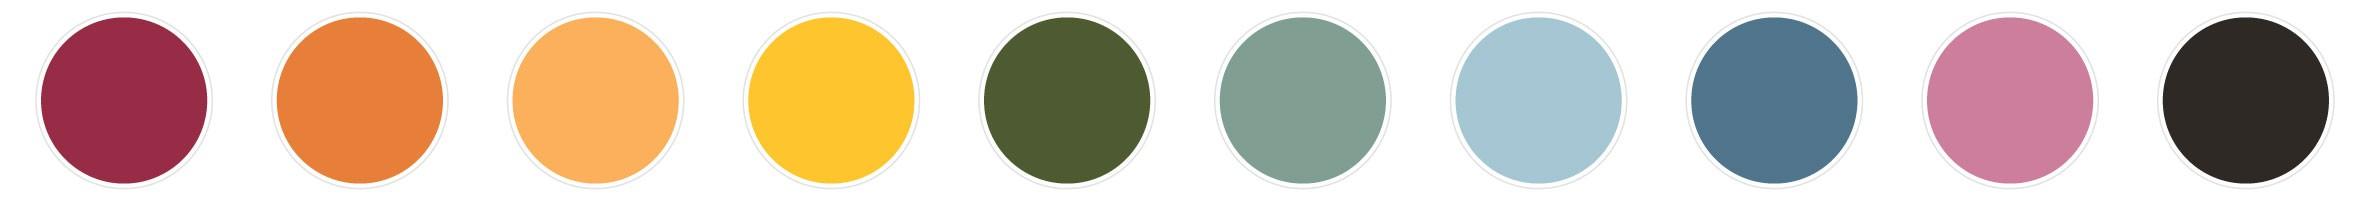 Sc preview colorpalette november desktop